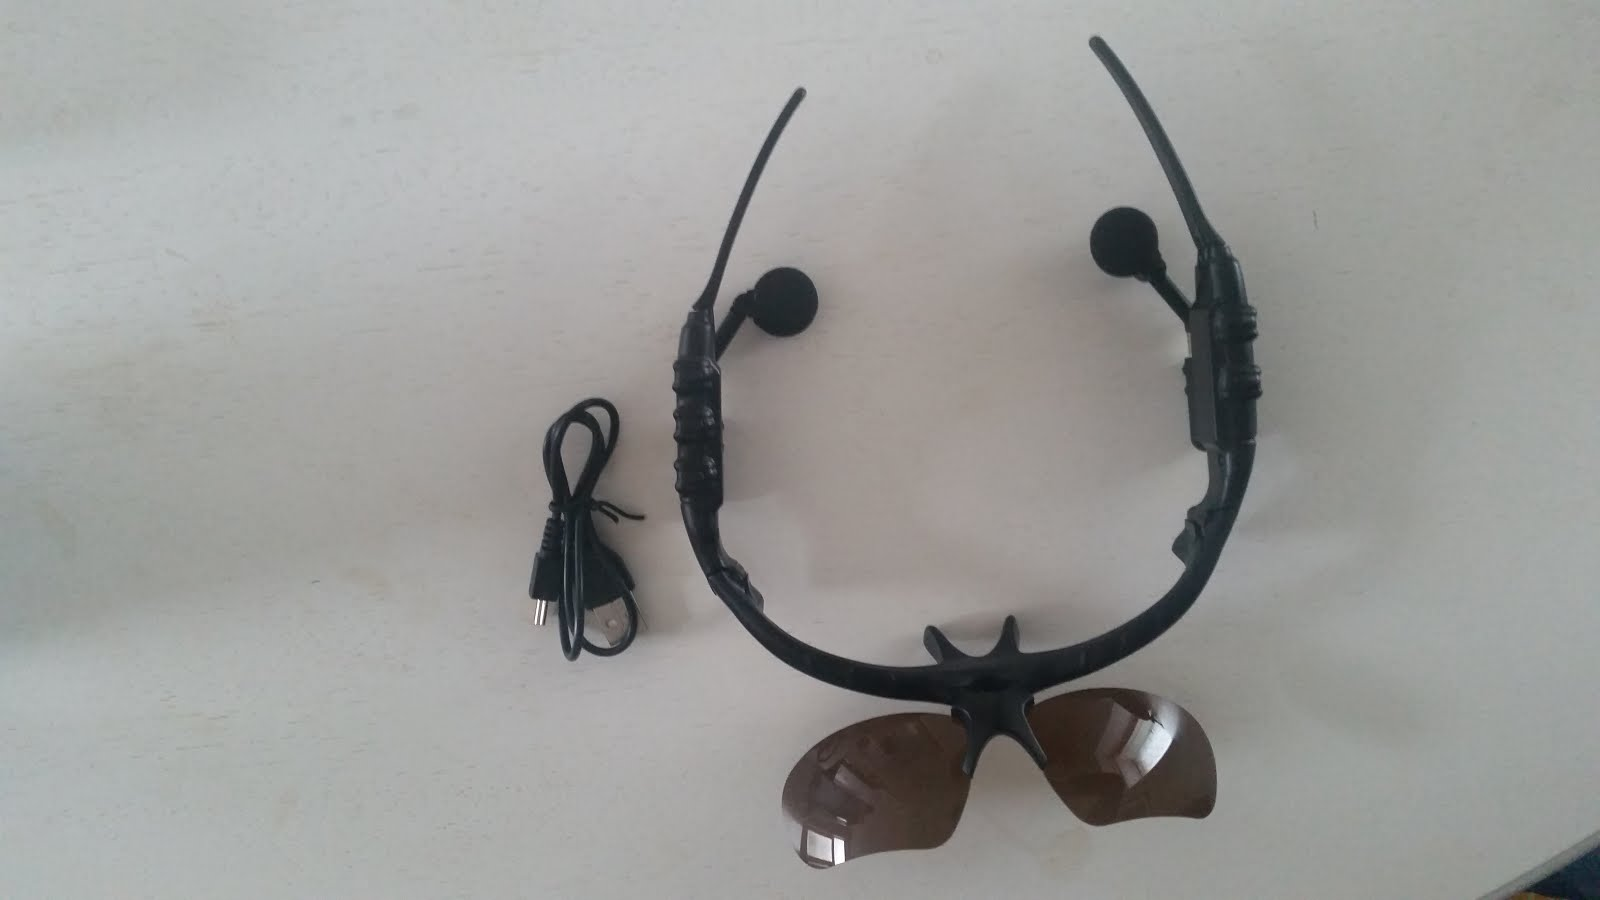 LUNETTES DE SOLEIL BLUETOOTH NOIR MUSIC TELEPHONE SAMSUNG IPHONE HTC + HOUSSE www.avalonlineshopping.com 17.jpg